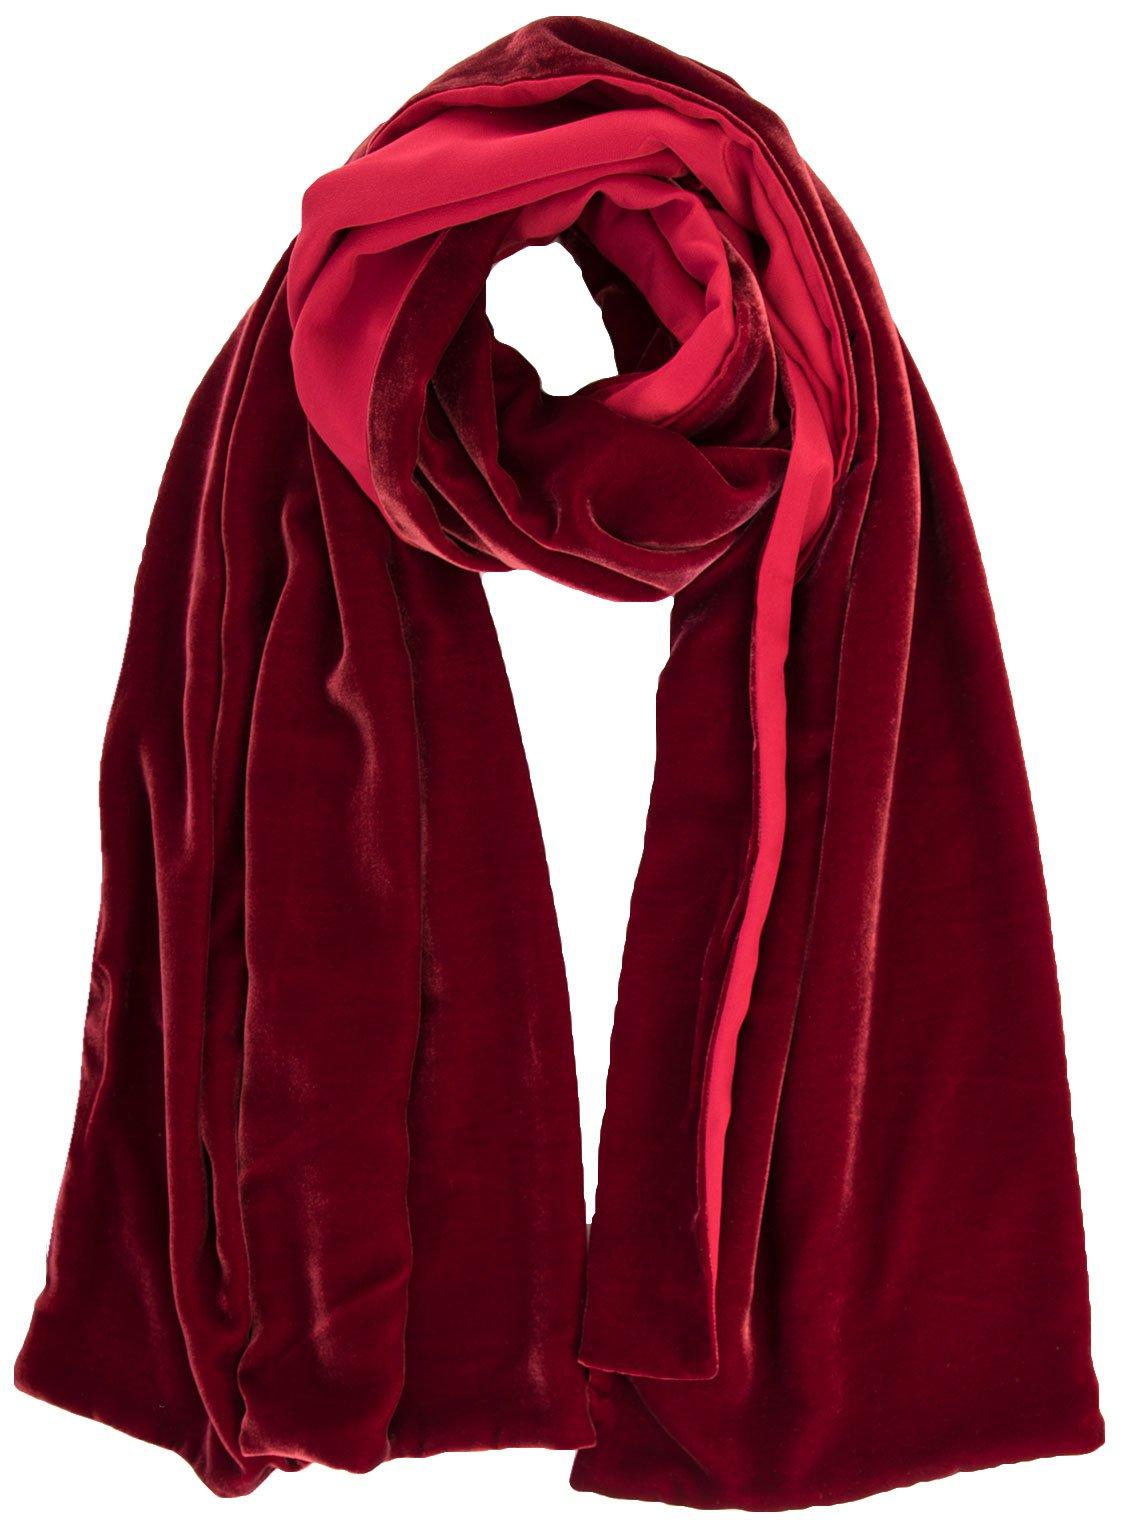 Elizabetta Womens Black Silk Velvet Evening Wrap Shawl - Made in Italy (Sophia Ruby Red)